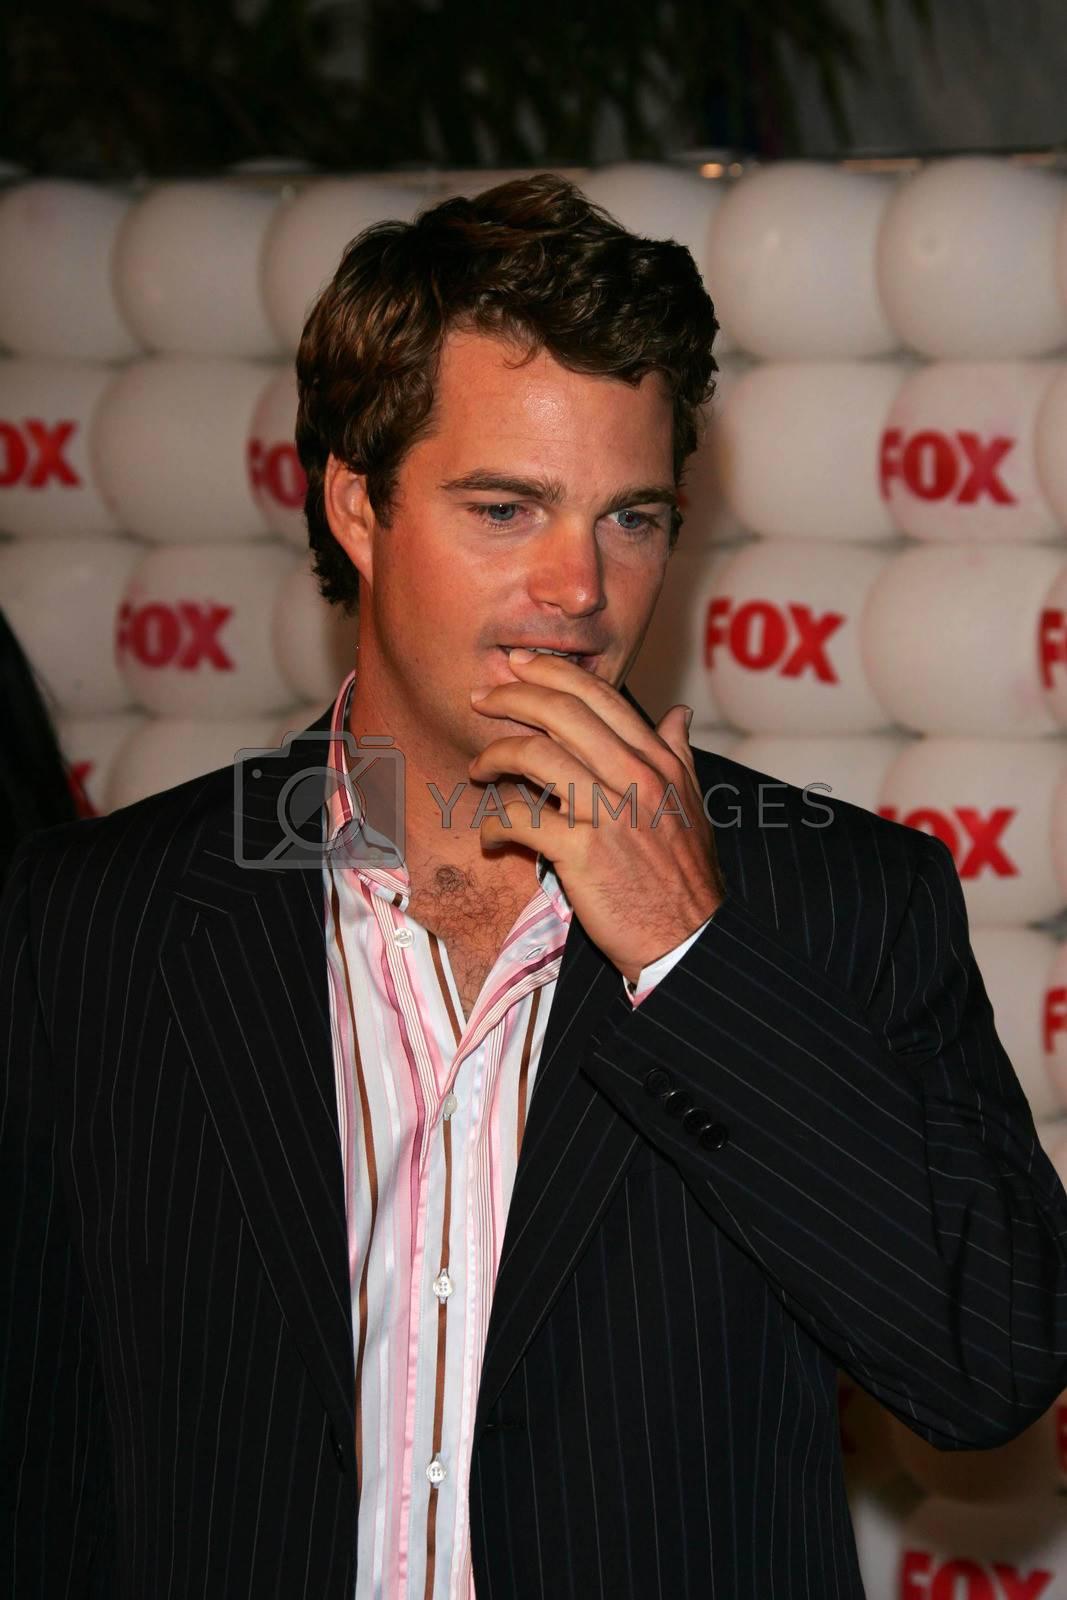 Chris O'Donnell At the FOX Summer 2005 TCA Party, Santa Monica Pier, Santa Monica, CA 07-29-05